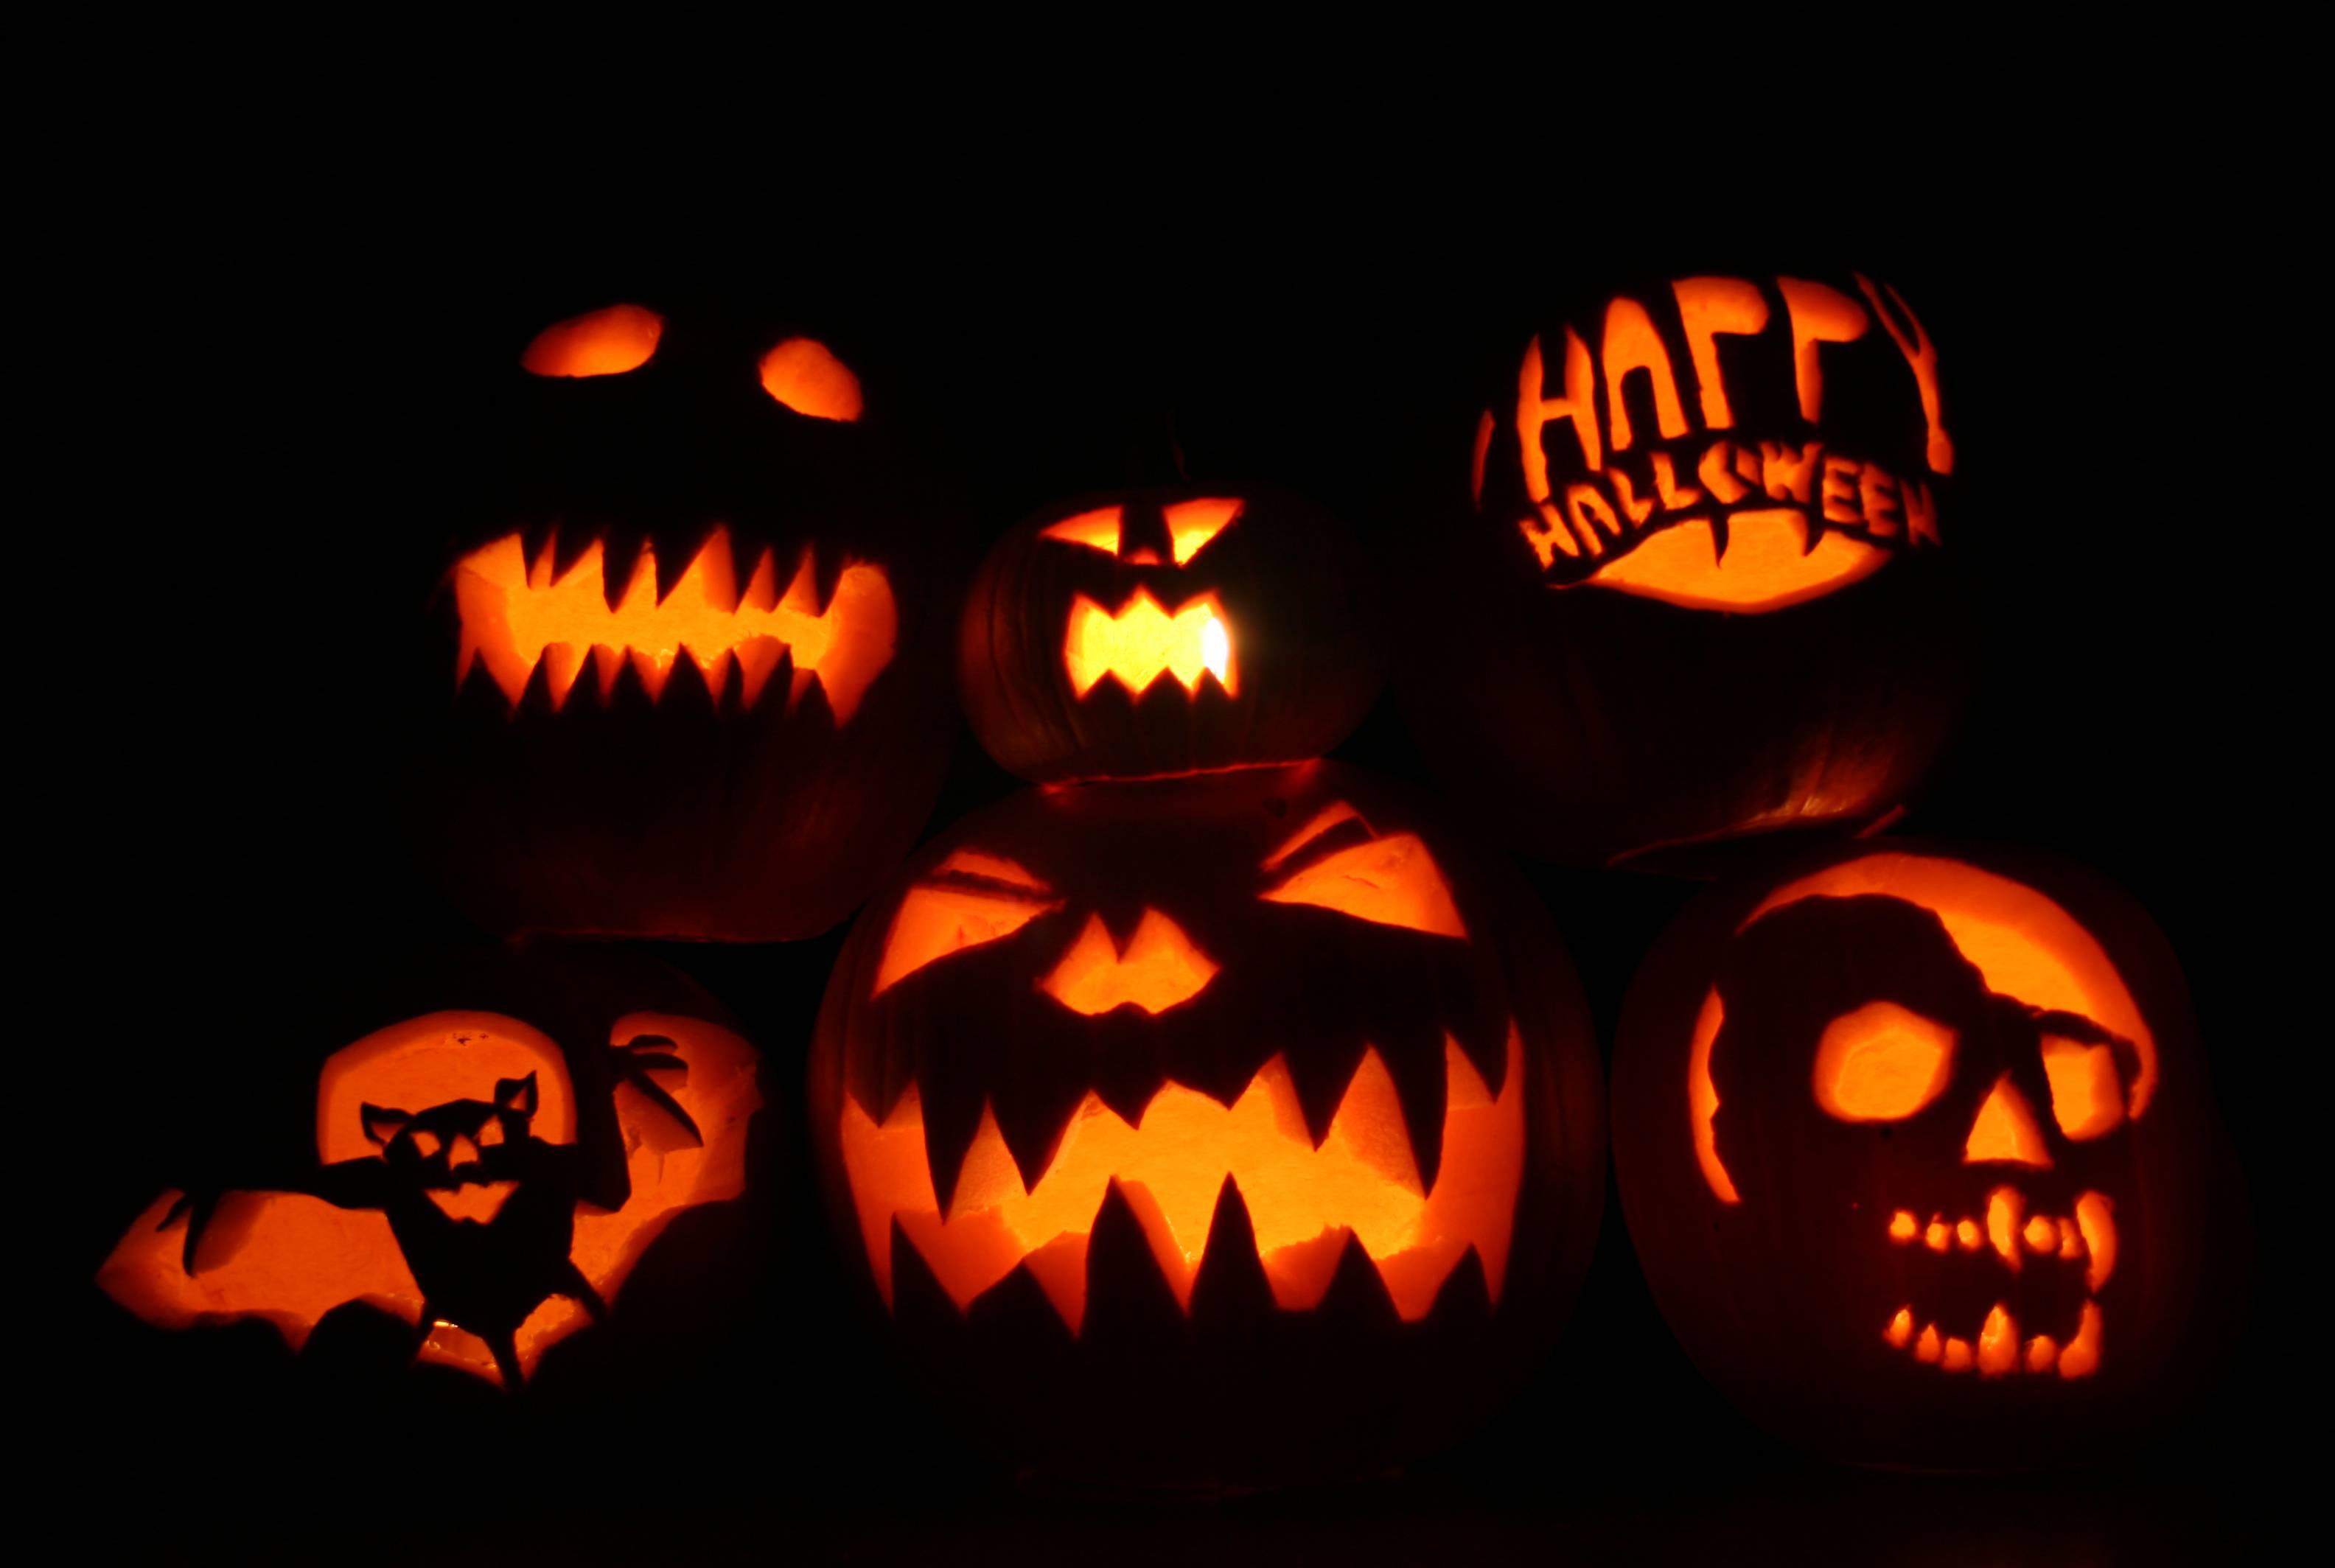 Top Halloween Image & Wallpapers Kurt Epperson